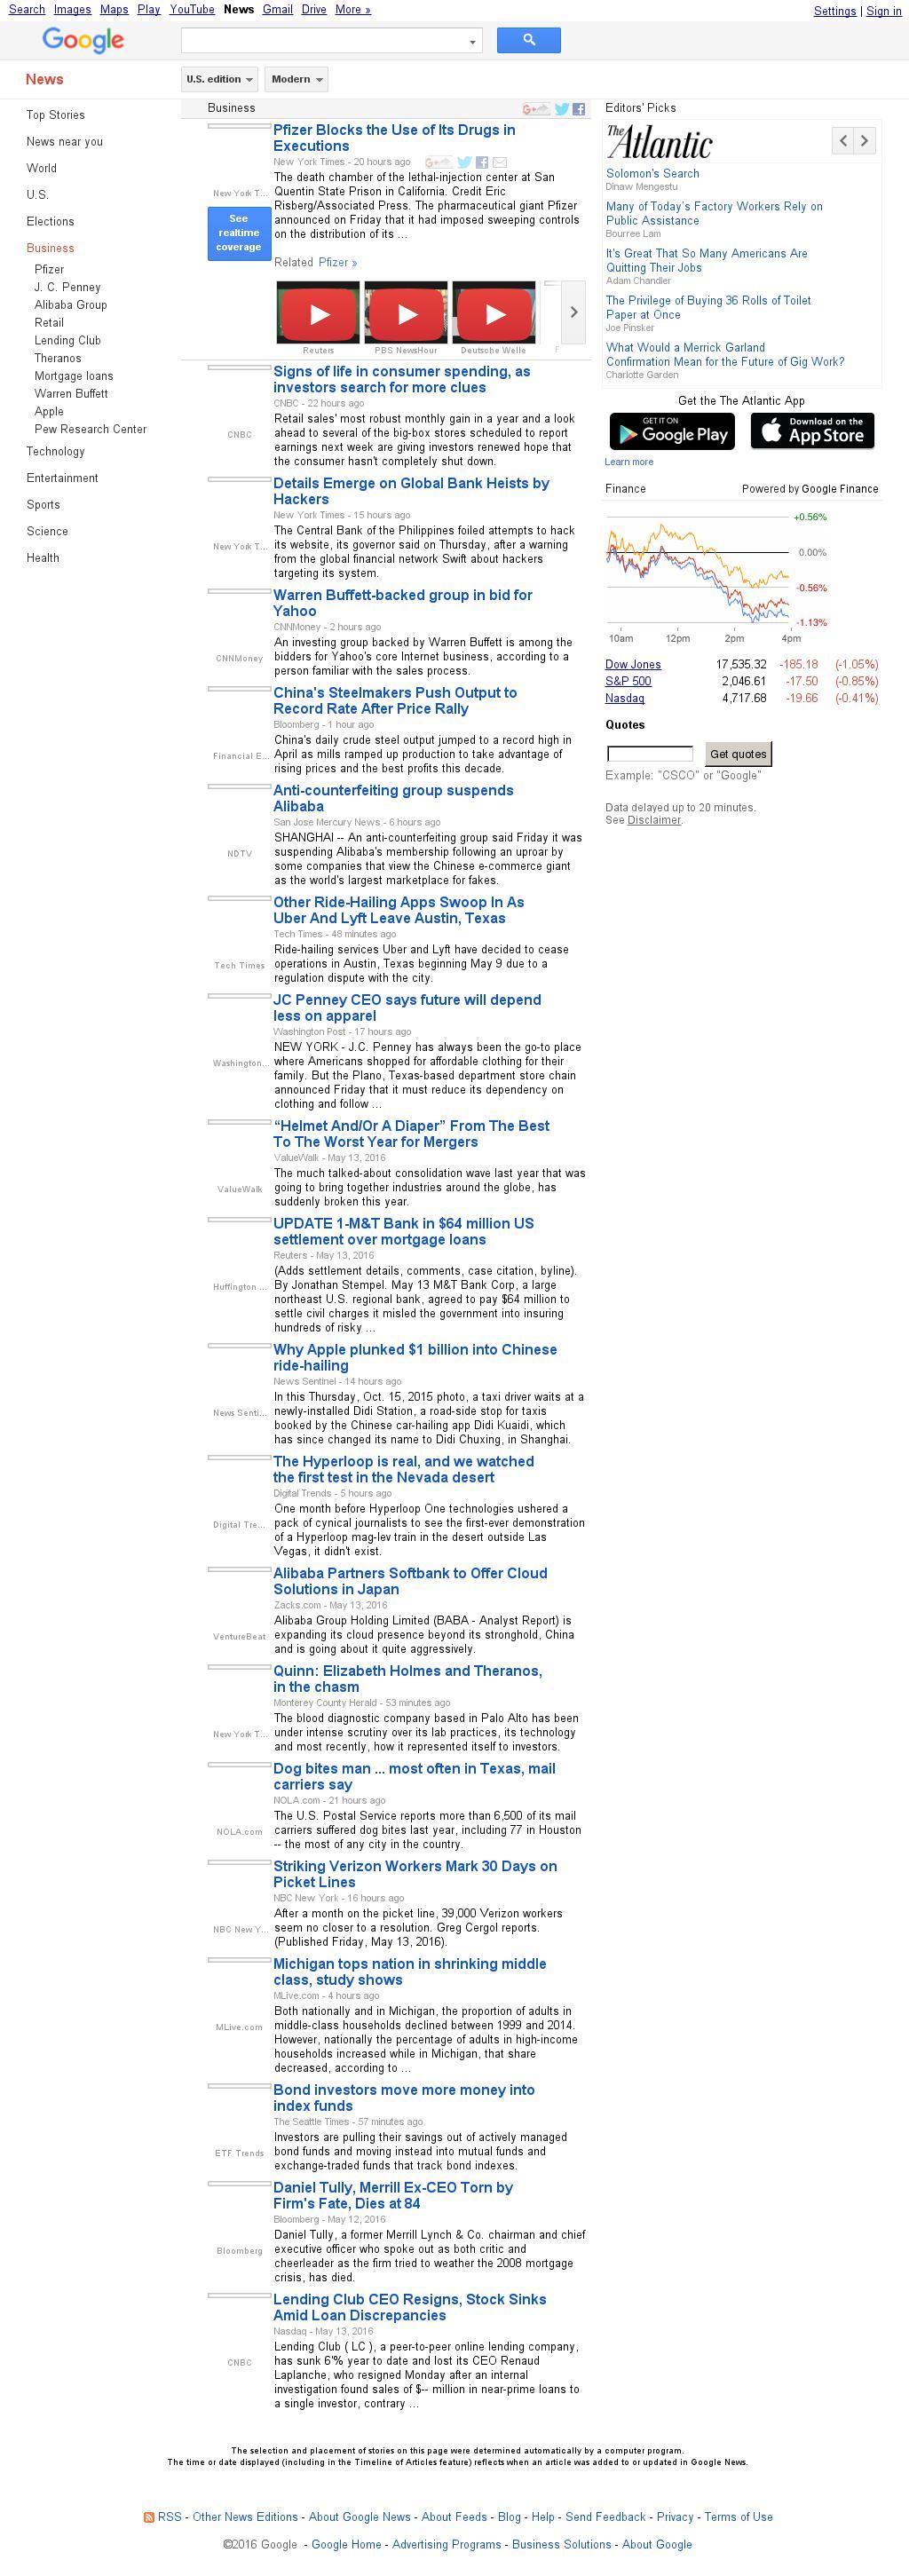 Google News: Business at Saturday May 14, 2016, 4:06 p.m. UTC